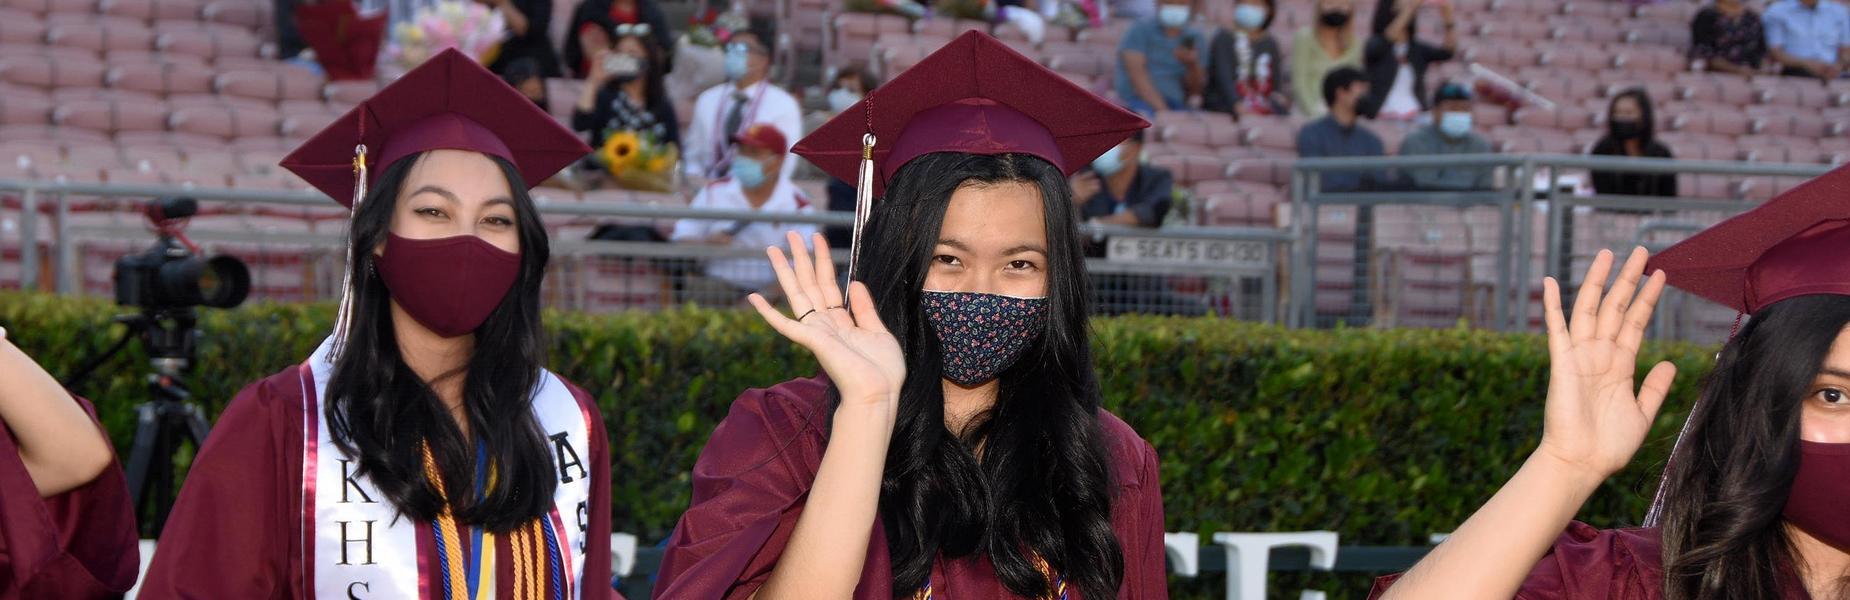 MKHS 2021 Graduates Wave